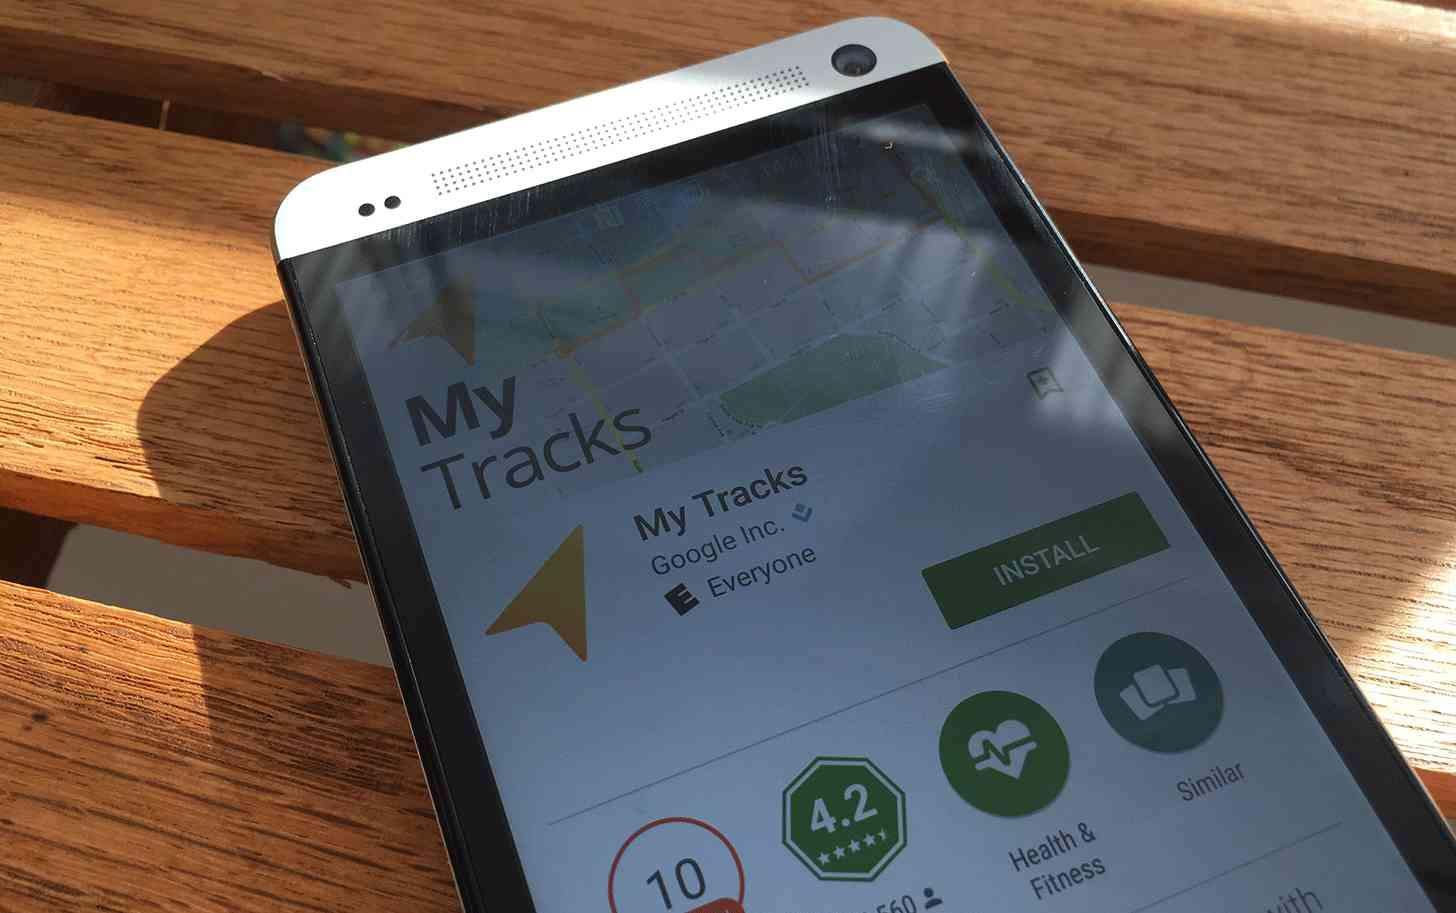 Google My Tracks Android app